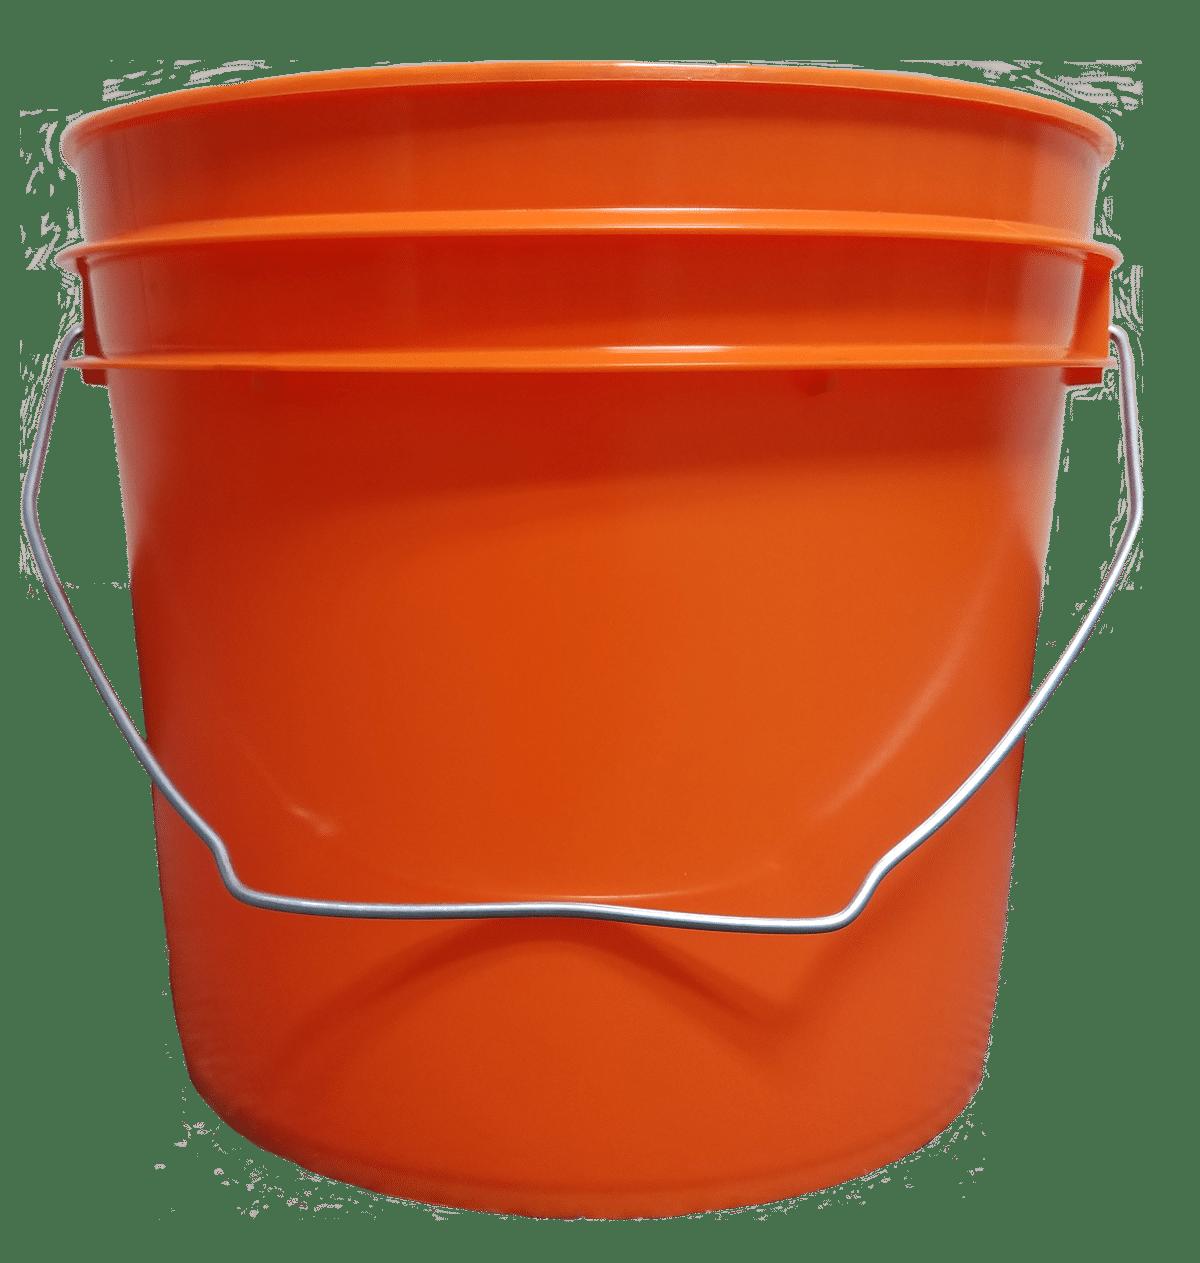 Bulk 1 Gallon Round Plastic Buckets W Wire Bale Handle